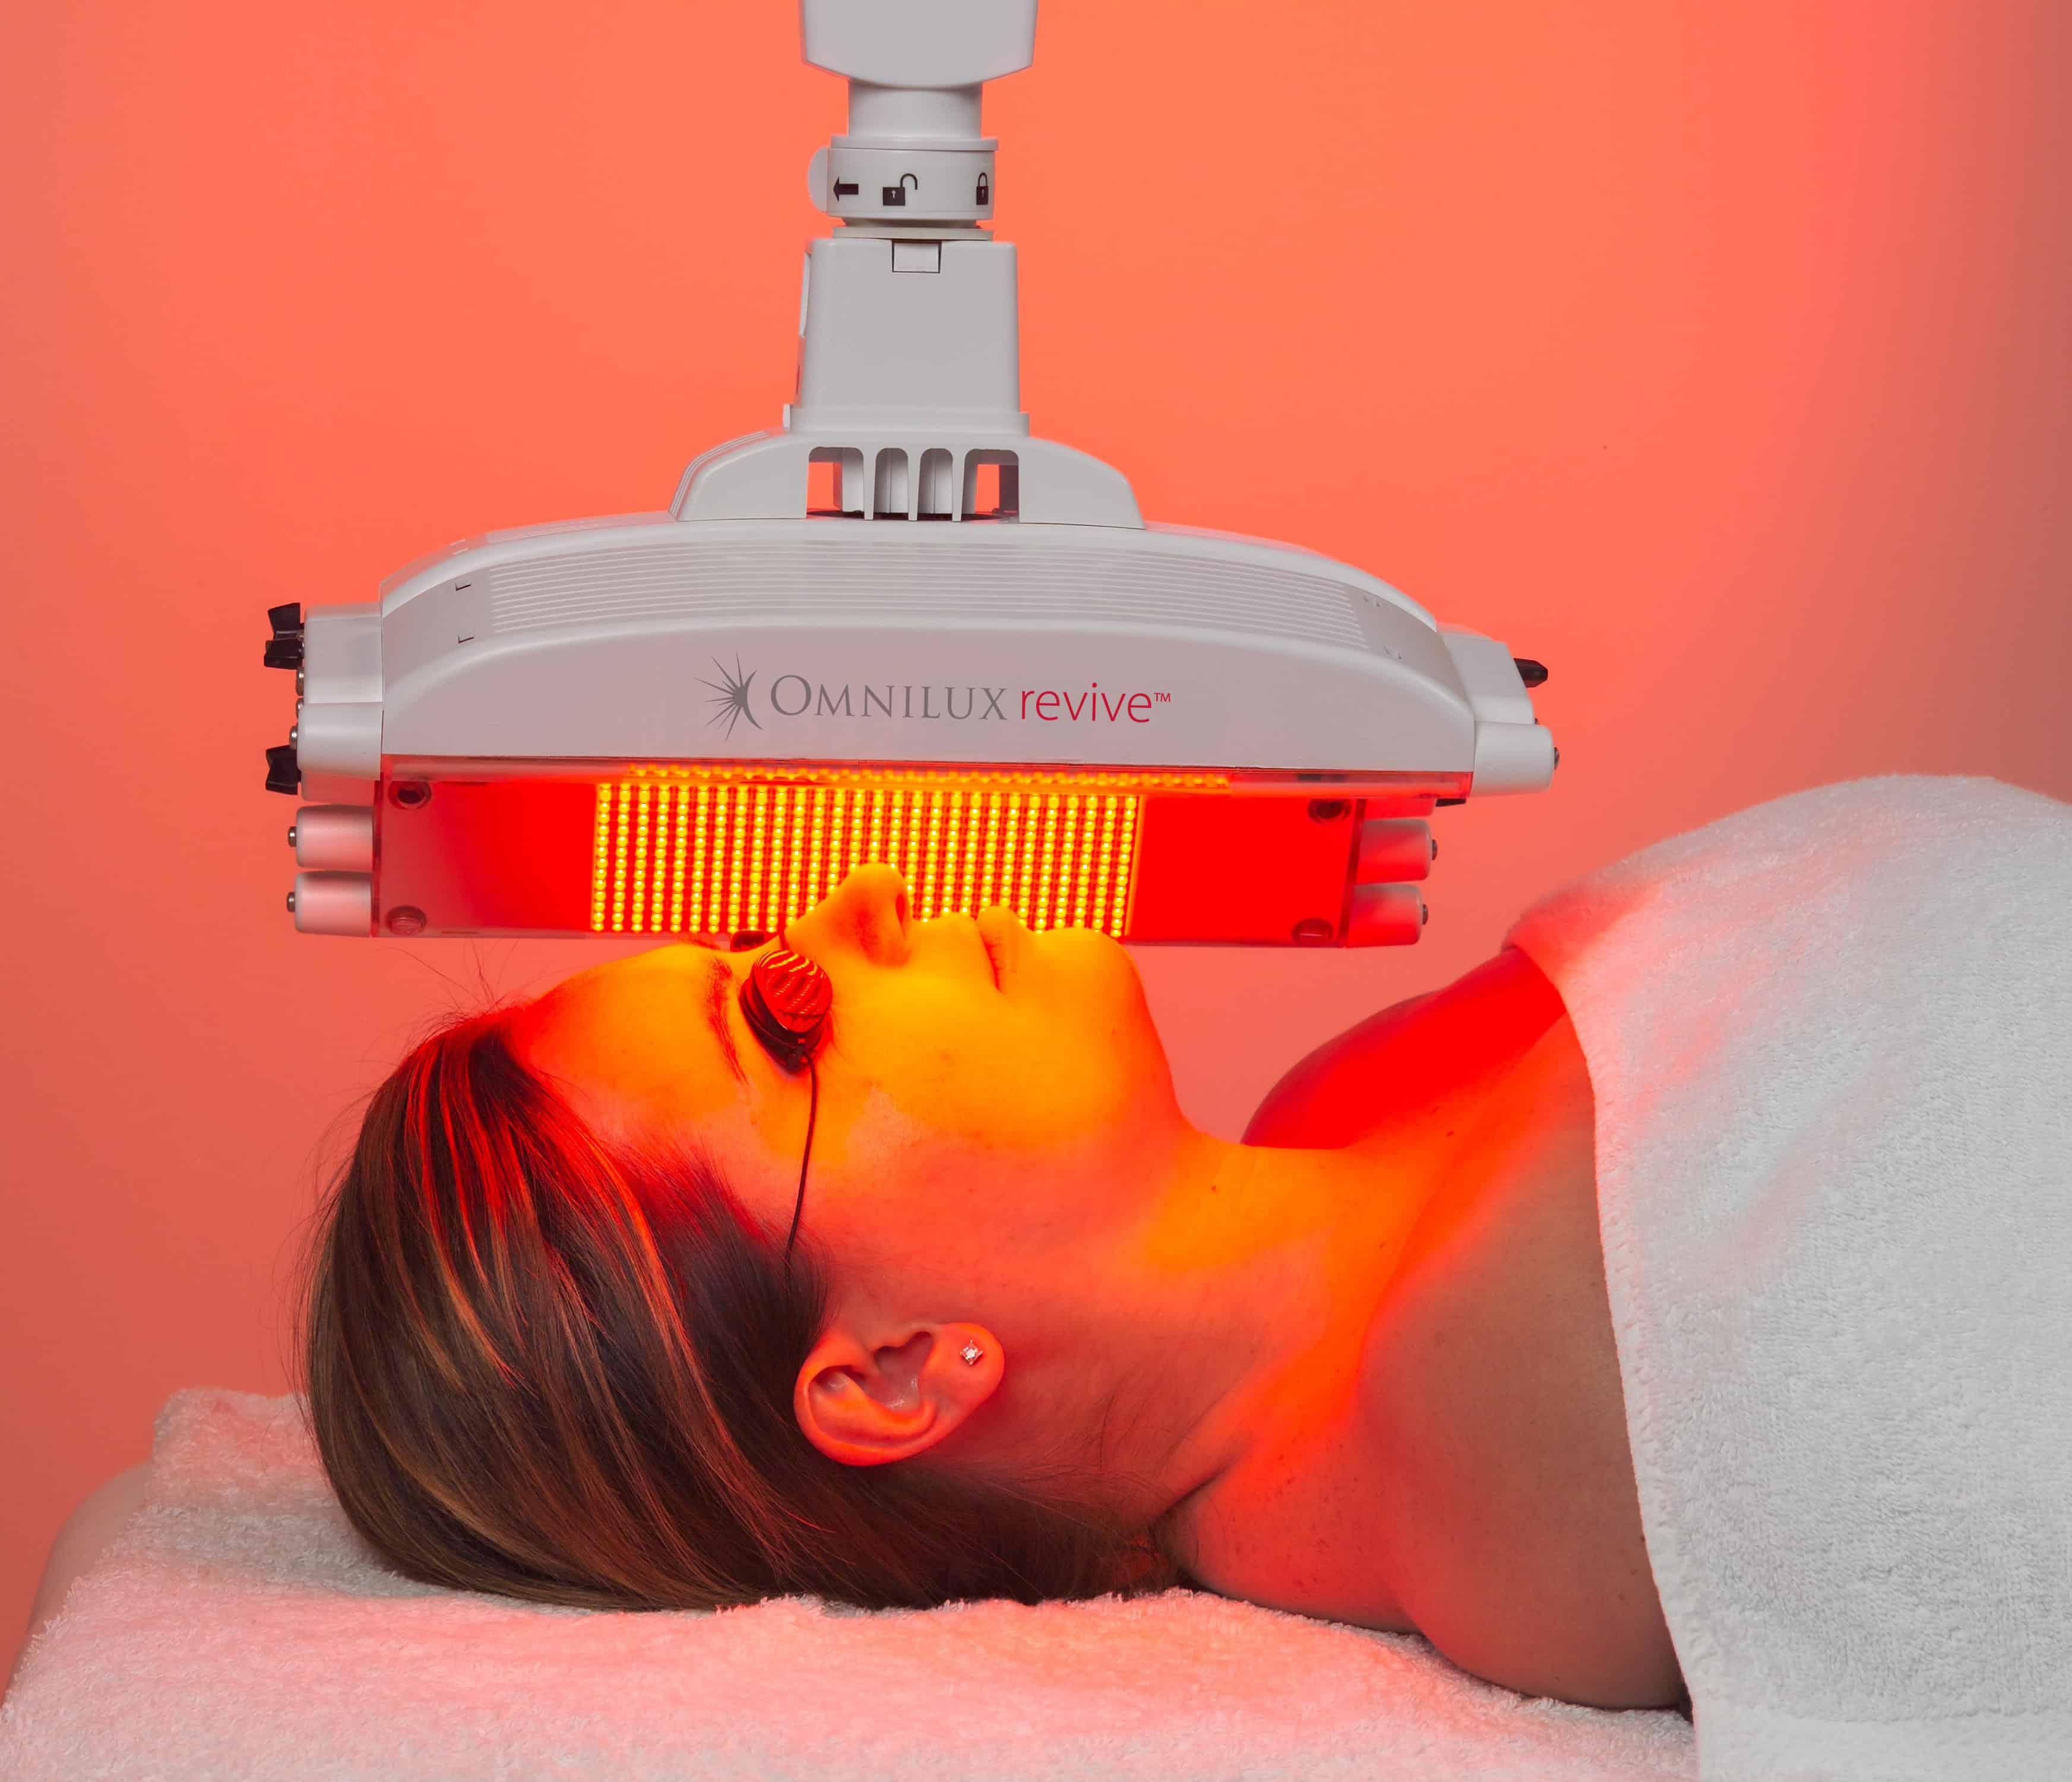 omnilux revive 2, laser, rejuvenecimiento, facial, antiacné, antiarrugas, manchas, belium, medical, luz, belleza, piel